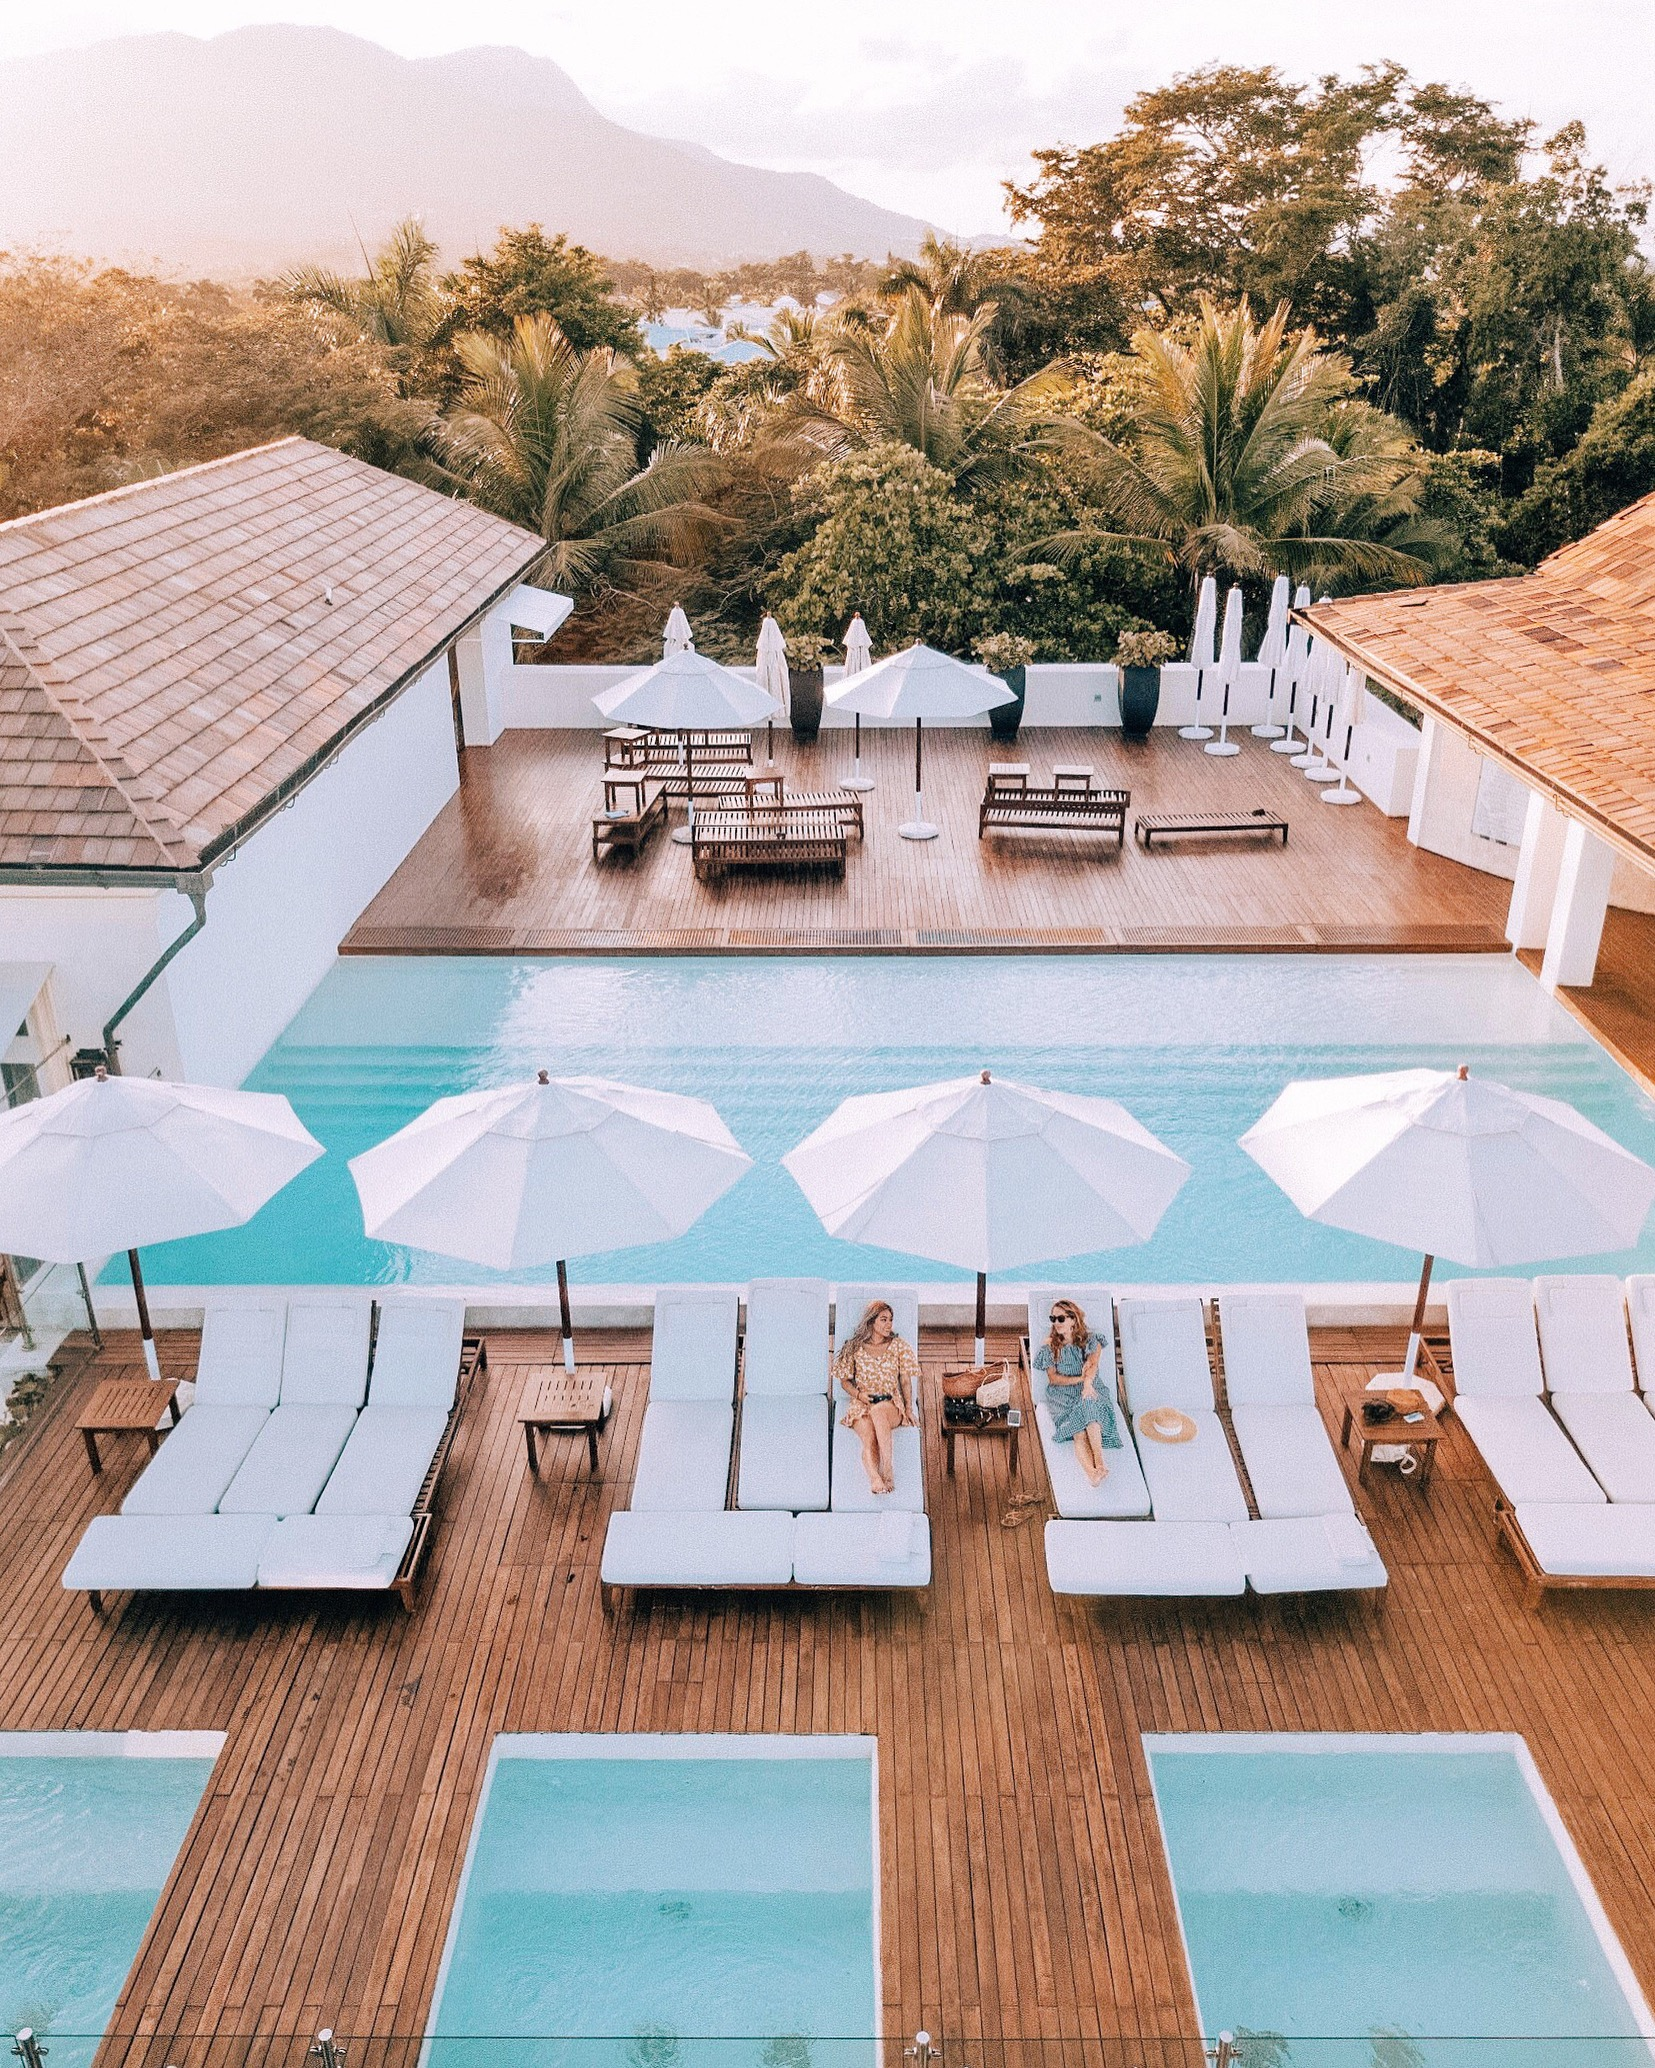 Sleep    Casa Colonial & Spa   /  Sea Horse Ranch Villas  /   Hodelpa Nicolas de Obando   /   The Beach Club at Sea Horse Ranch  /  Casas de XVI